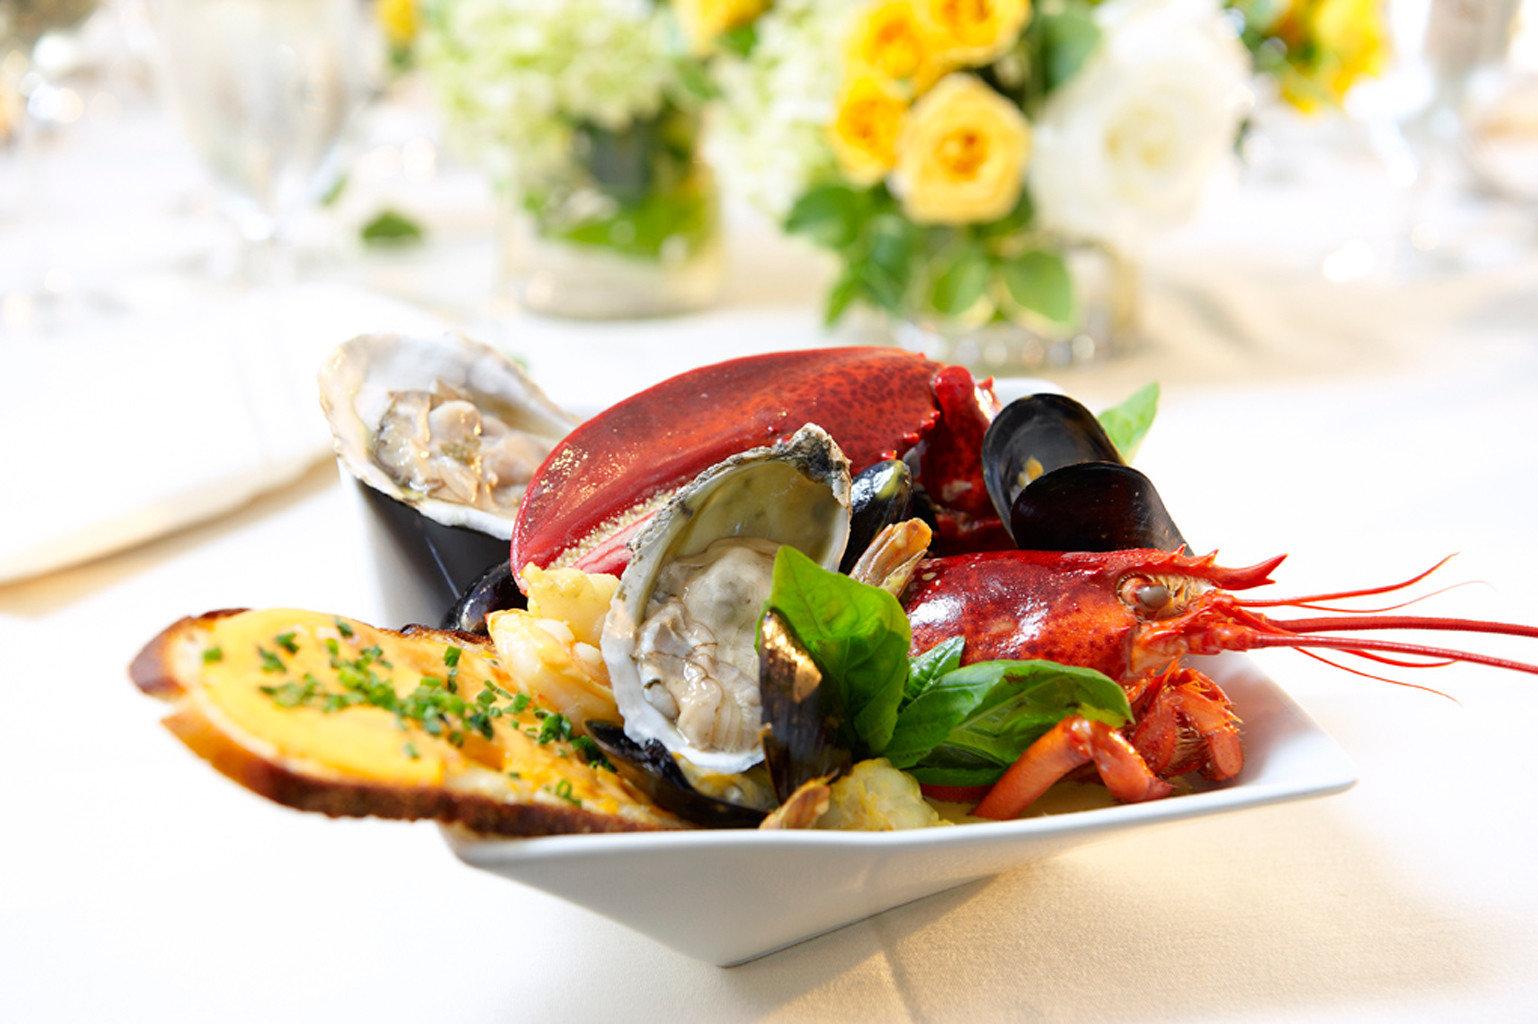 Dining Drink Eat Modern plate food Seafood mussel hors d oeuvre cuisine sense invertebrate lunch restaurant arranged